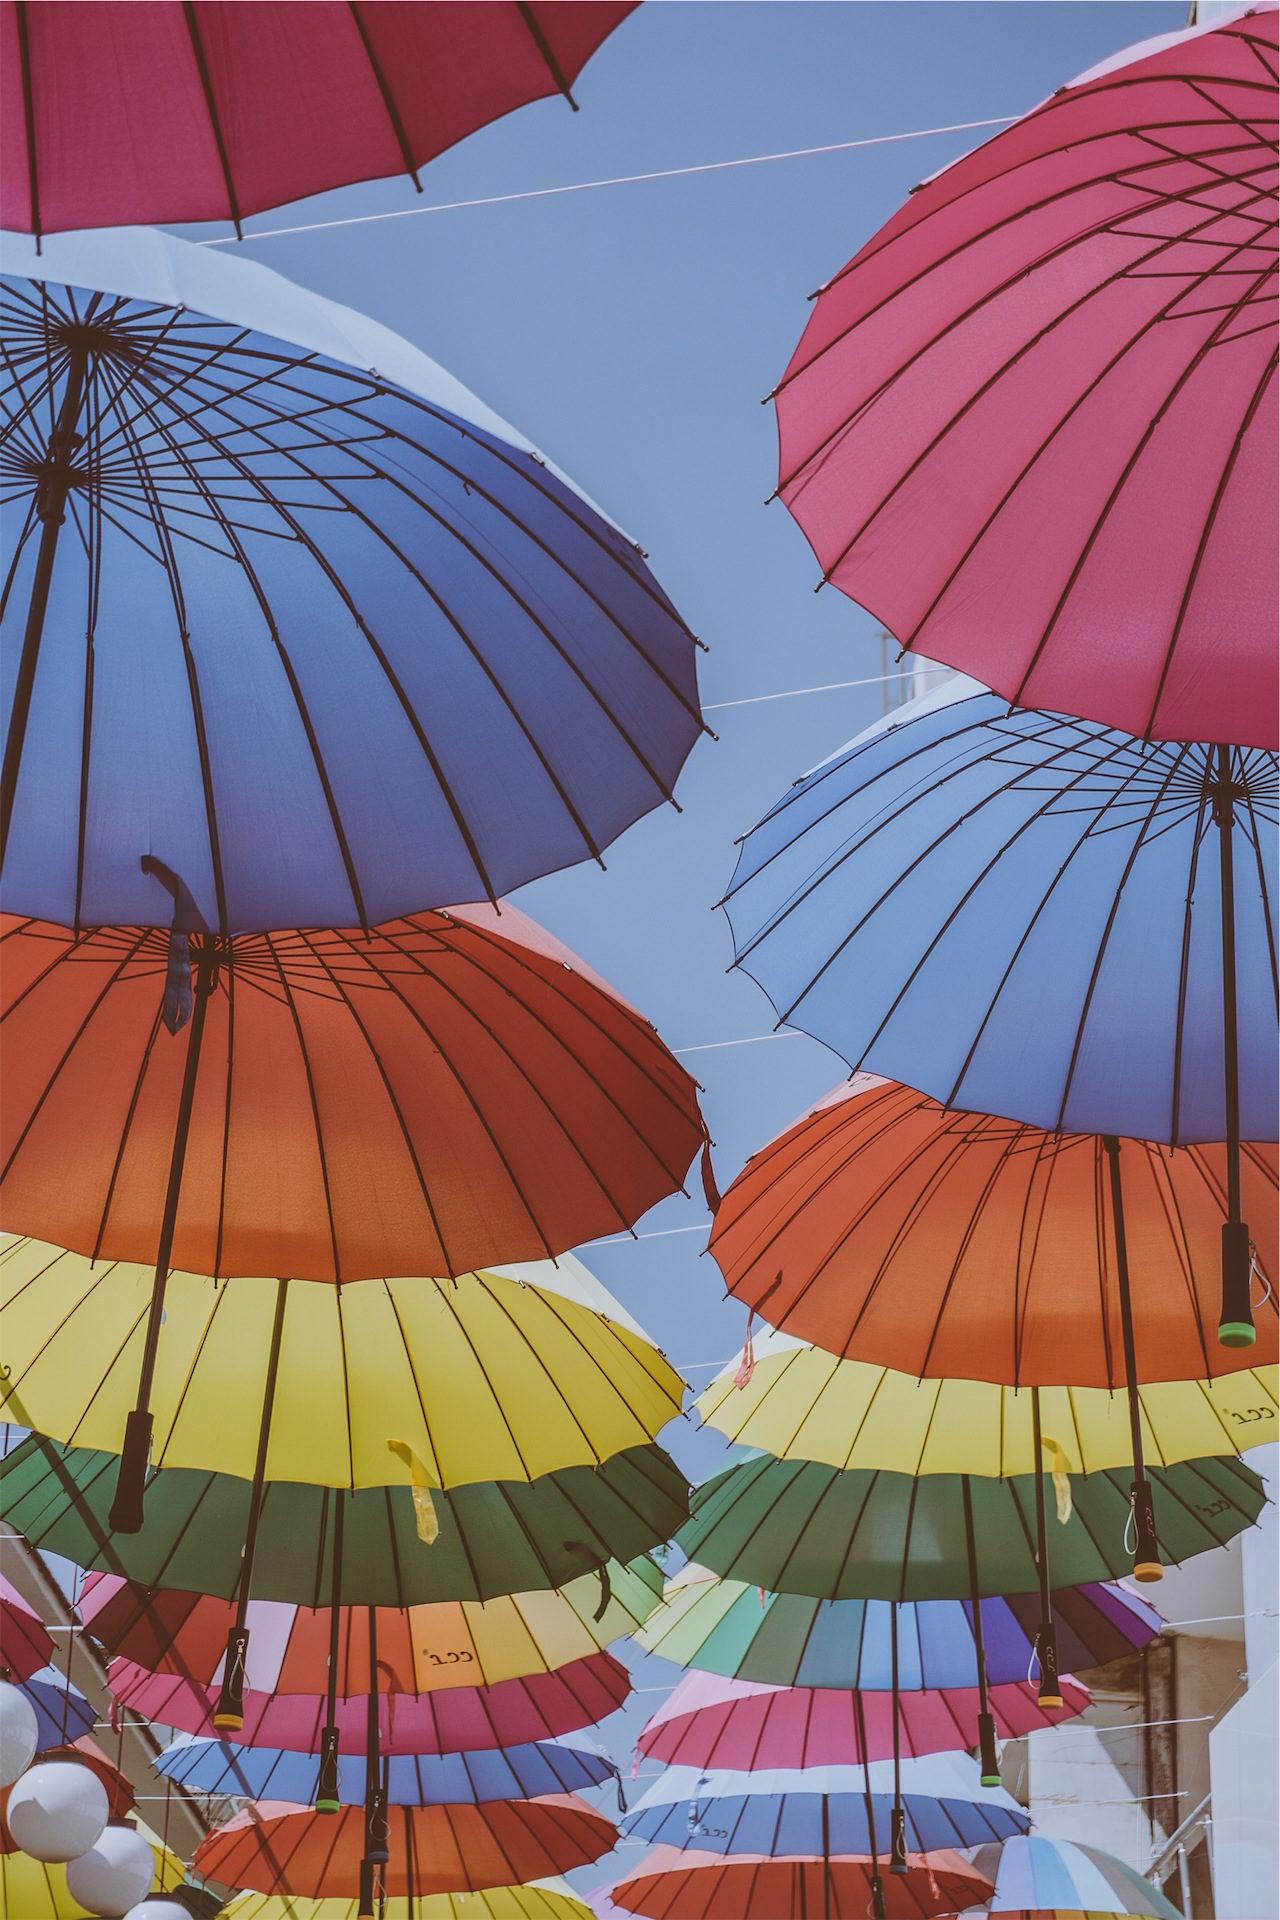 Regenschirm, bunte, fliegen, Aufgehängt, Ornamente - Wallpaper HD - Prof.-falken.com